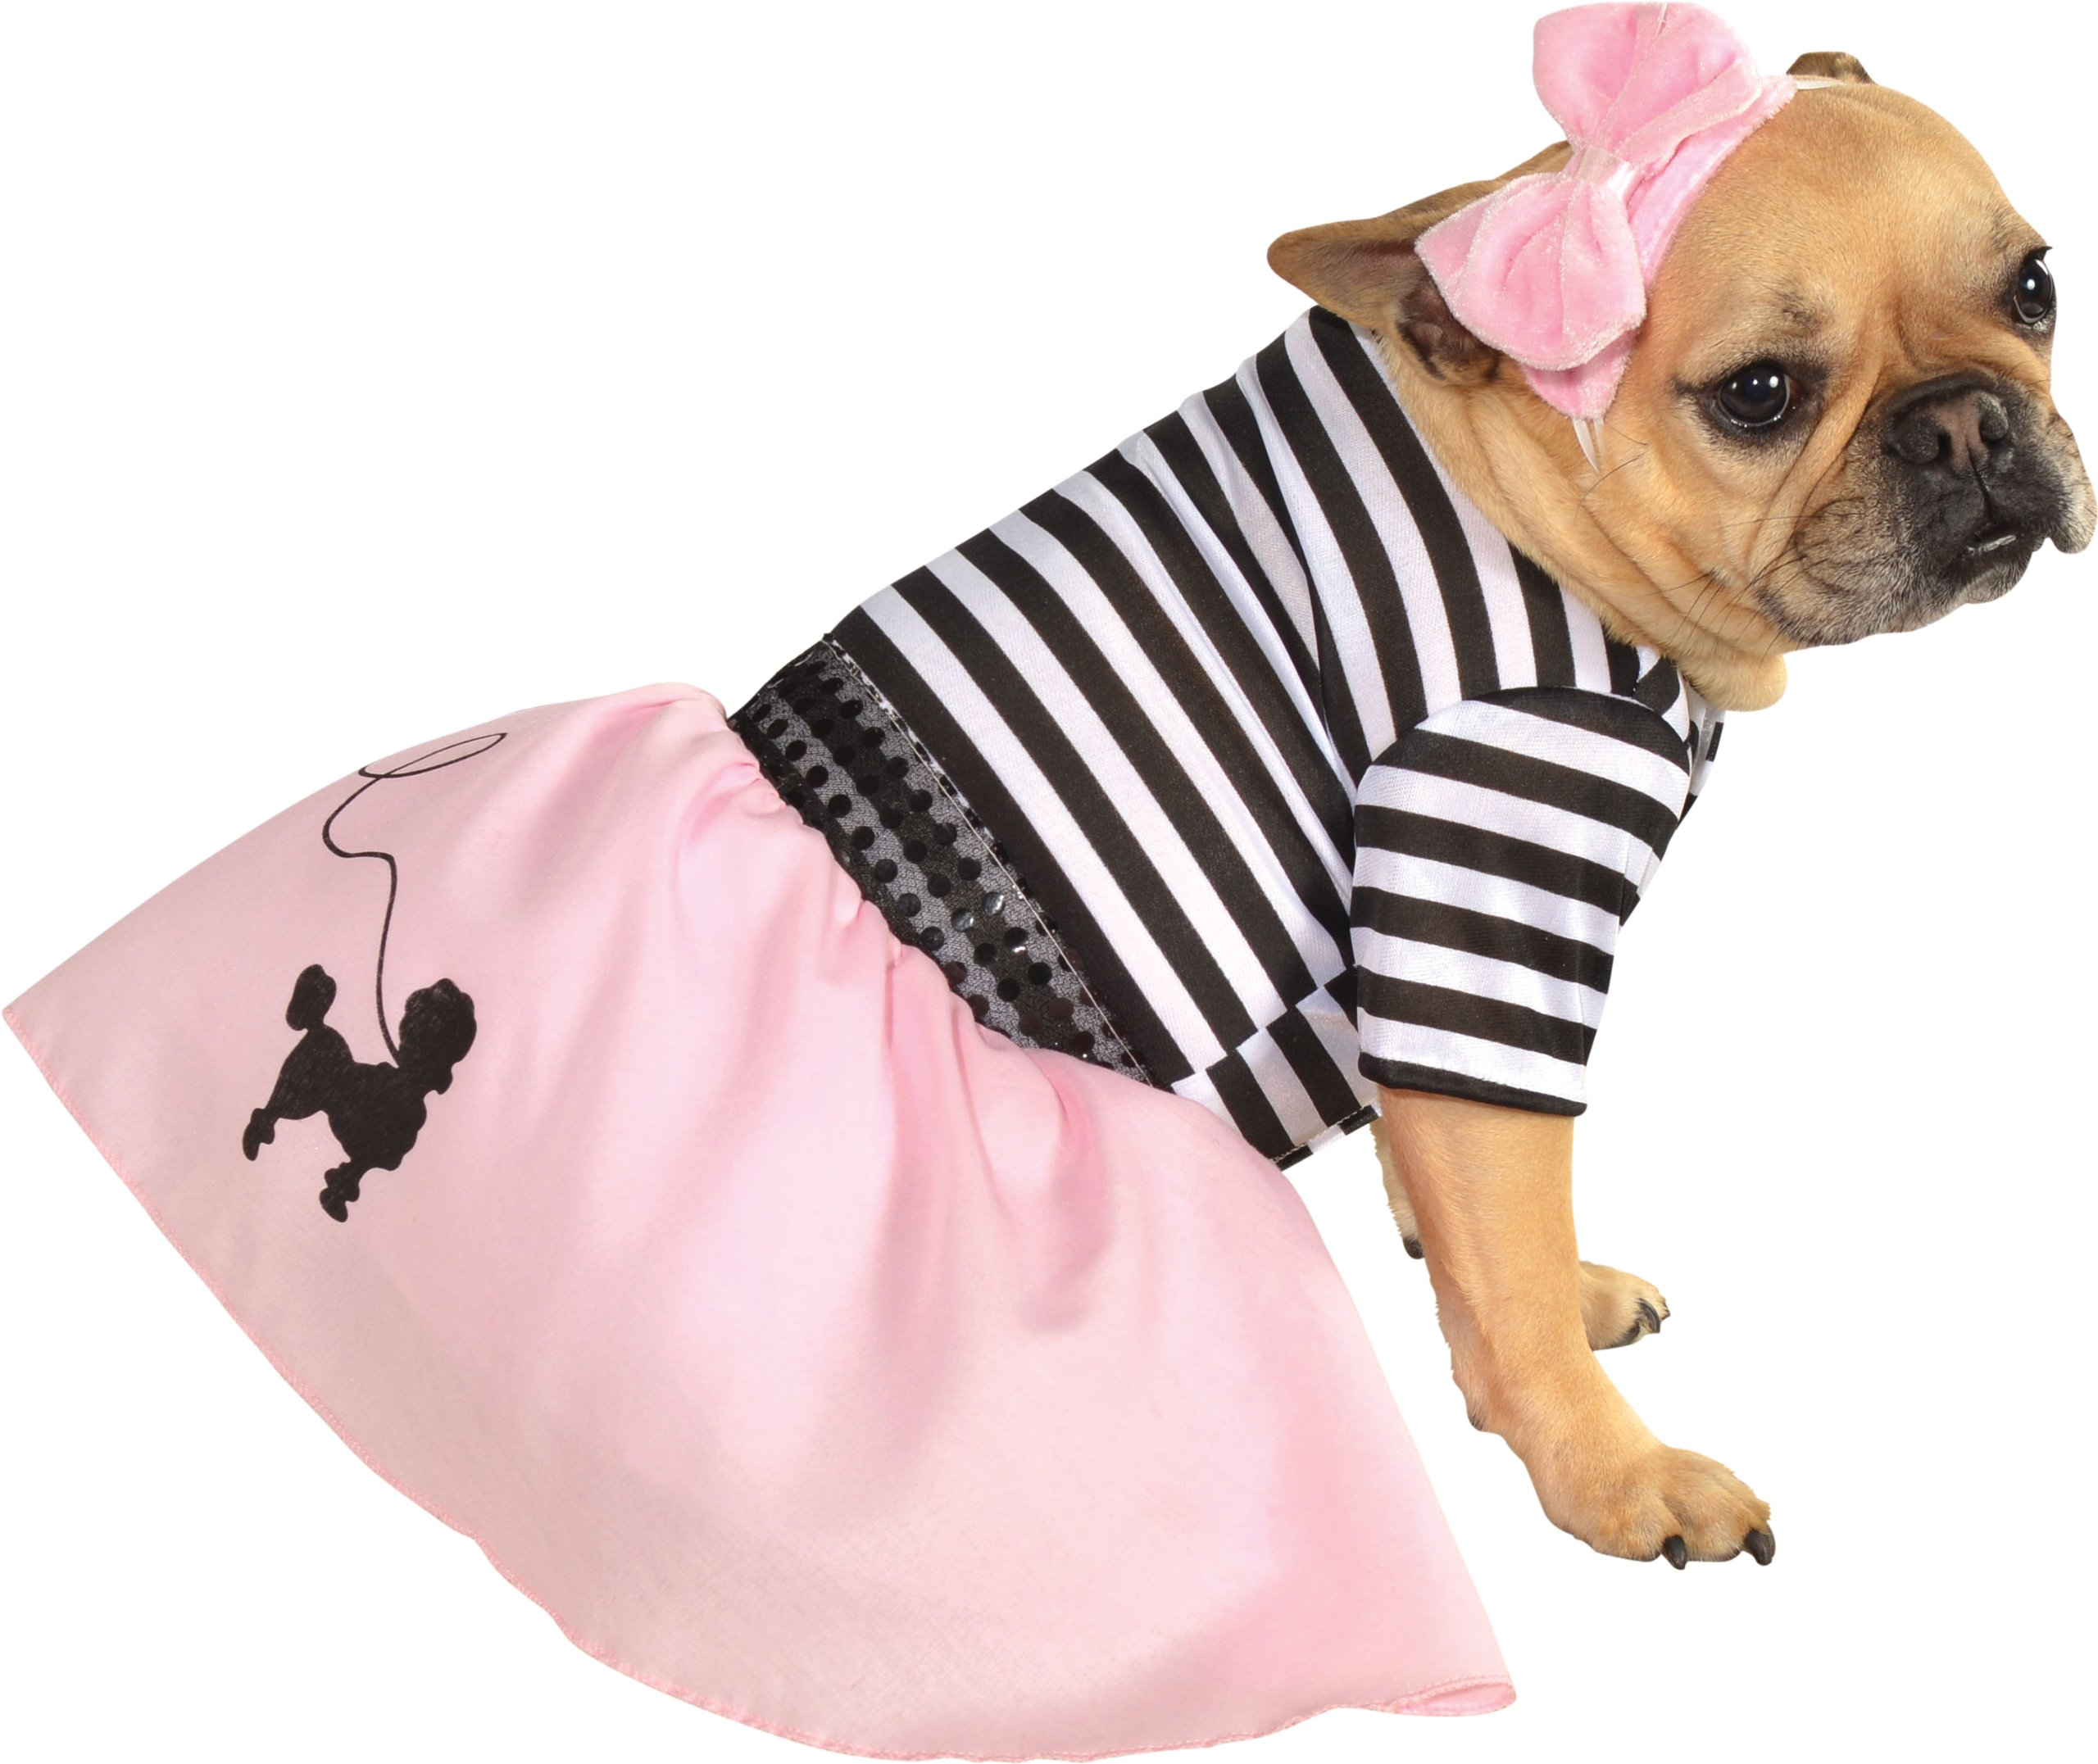 Rubie's Costume Co 50S Girl Pet Costume by Rubie's